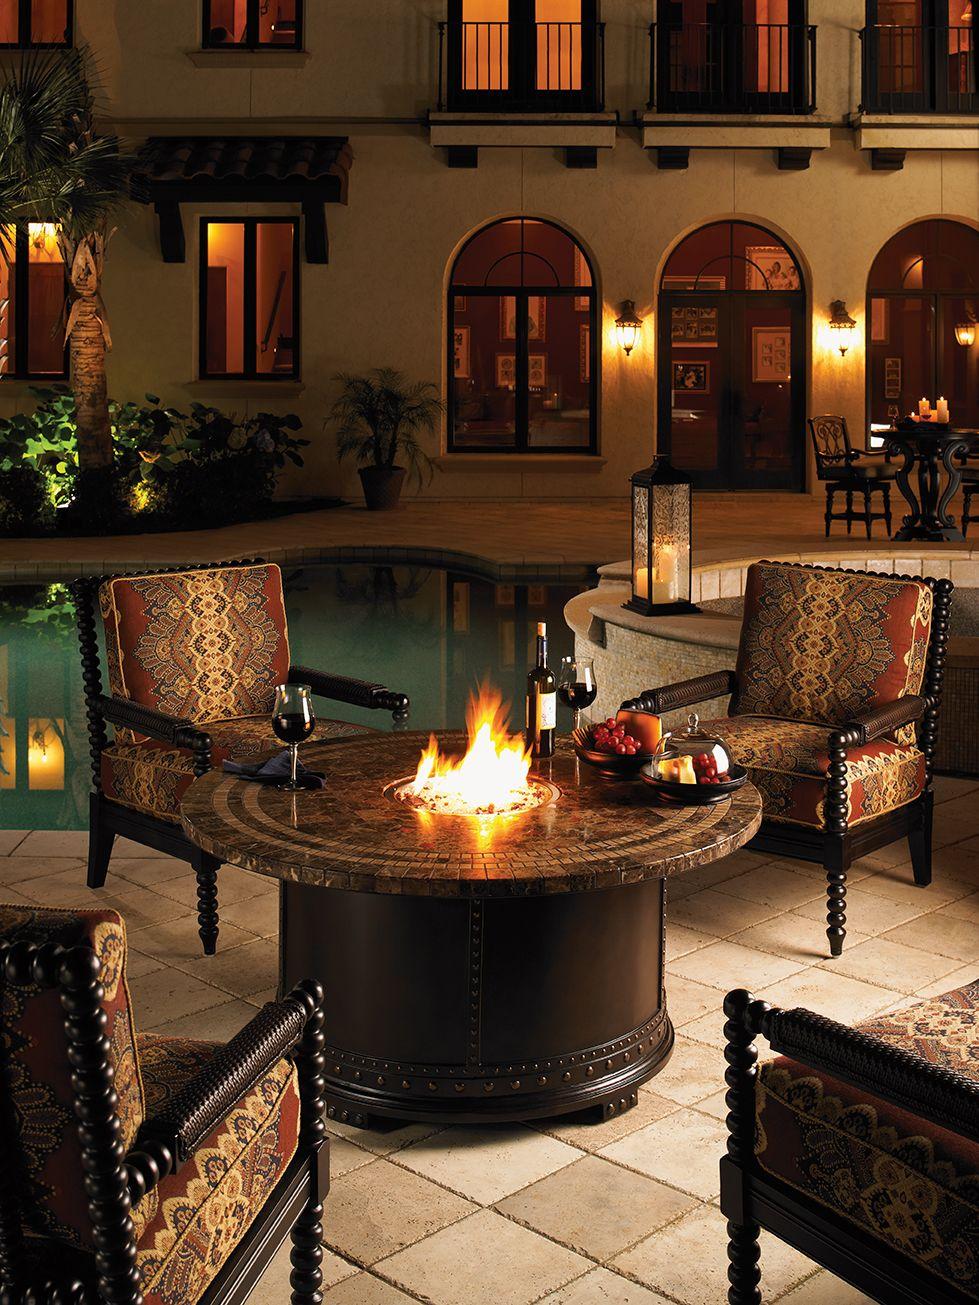 luxurypatio modern rattan tommy bahama outdoor furniture. Luxurypatio Modern Rattan Tommy Bahama Outdoor Furniture. - Kingstown Sedona Collection. Stone Furniture D